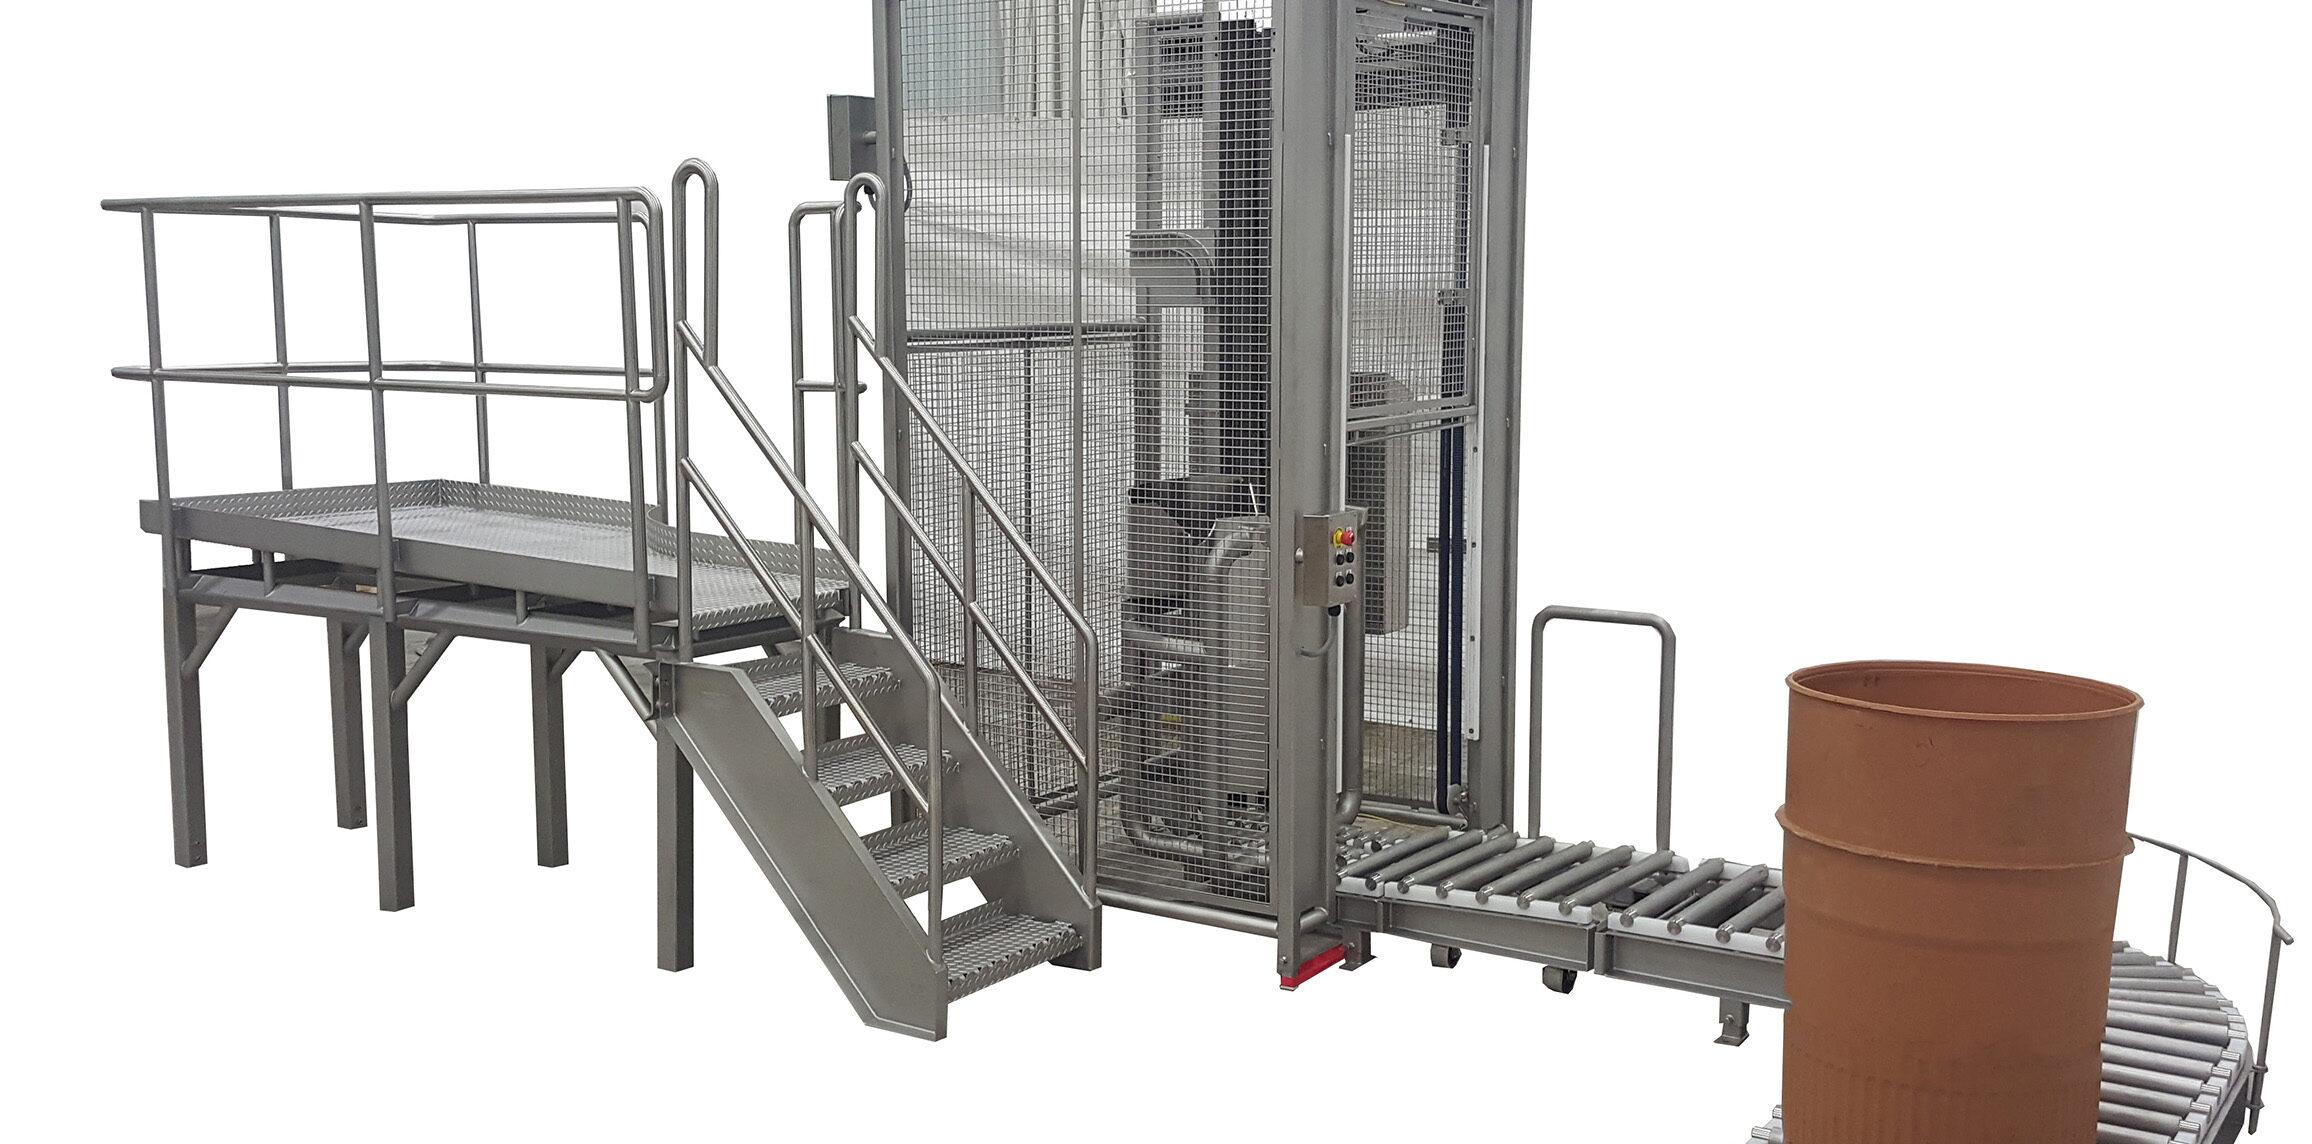 food processing dumping equipment